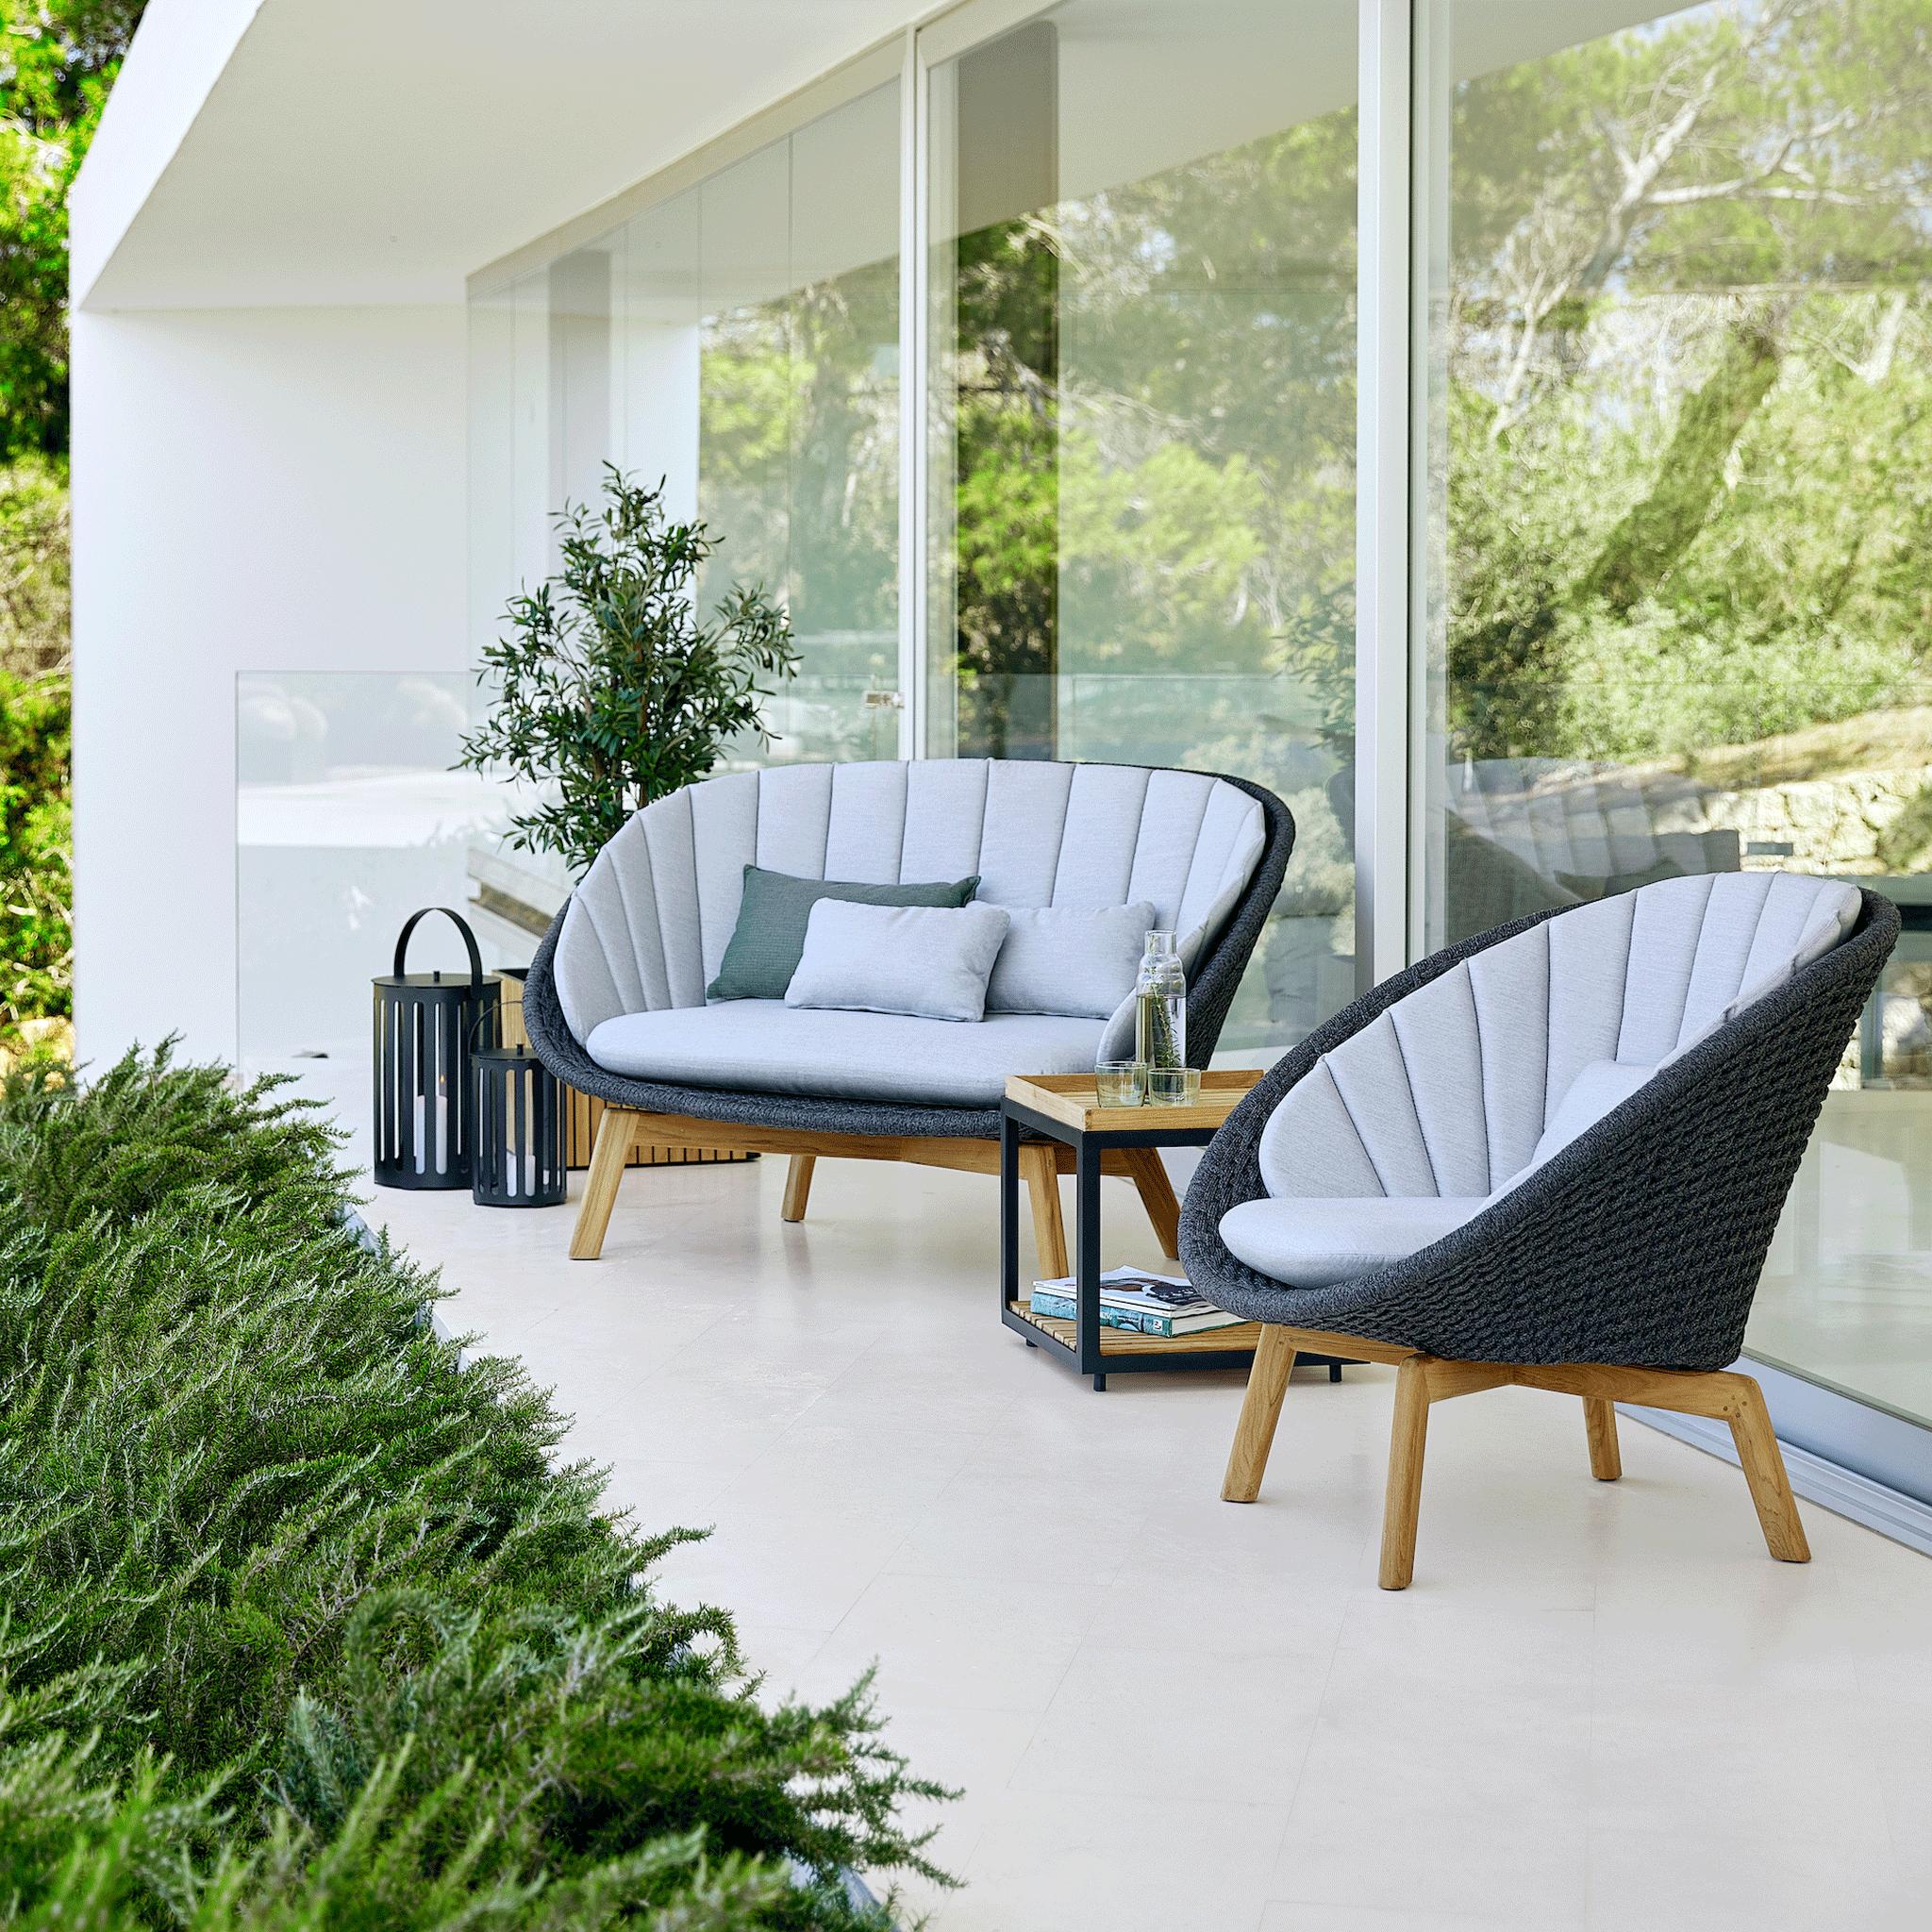 Full Size of Couch Terrasse 1 Cane Line Peacook Sofa Gartenstuhl Wohnzimmer Couch Terrasse